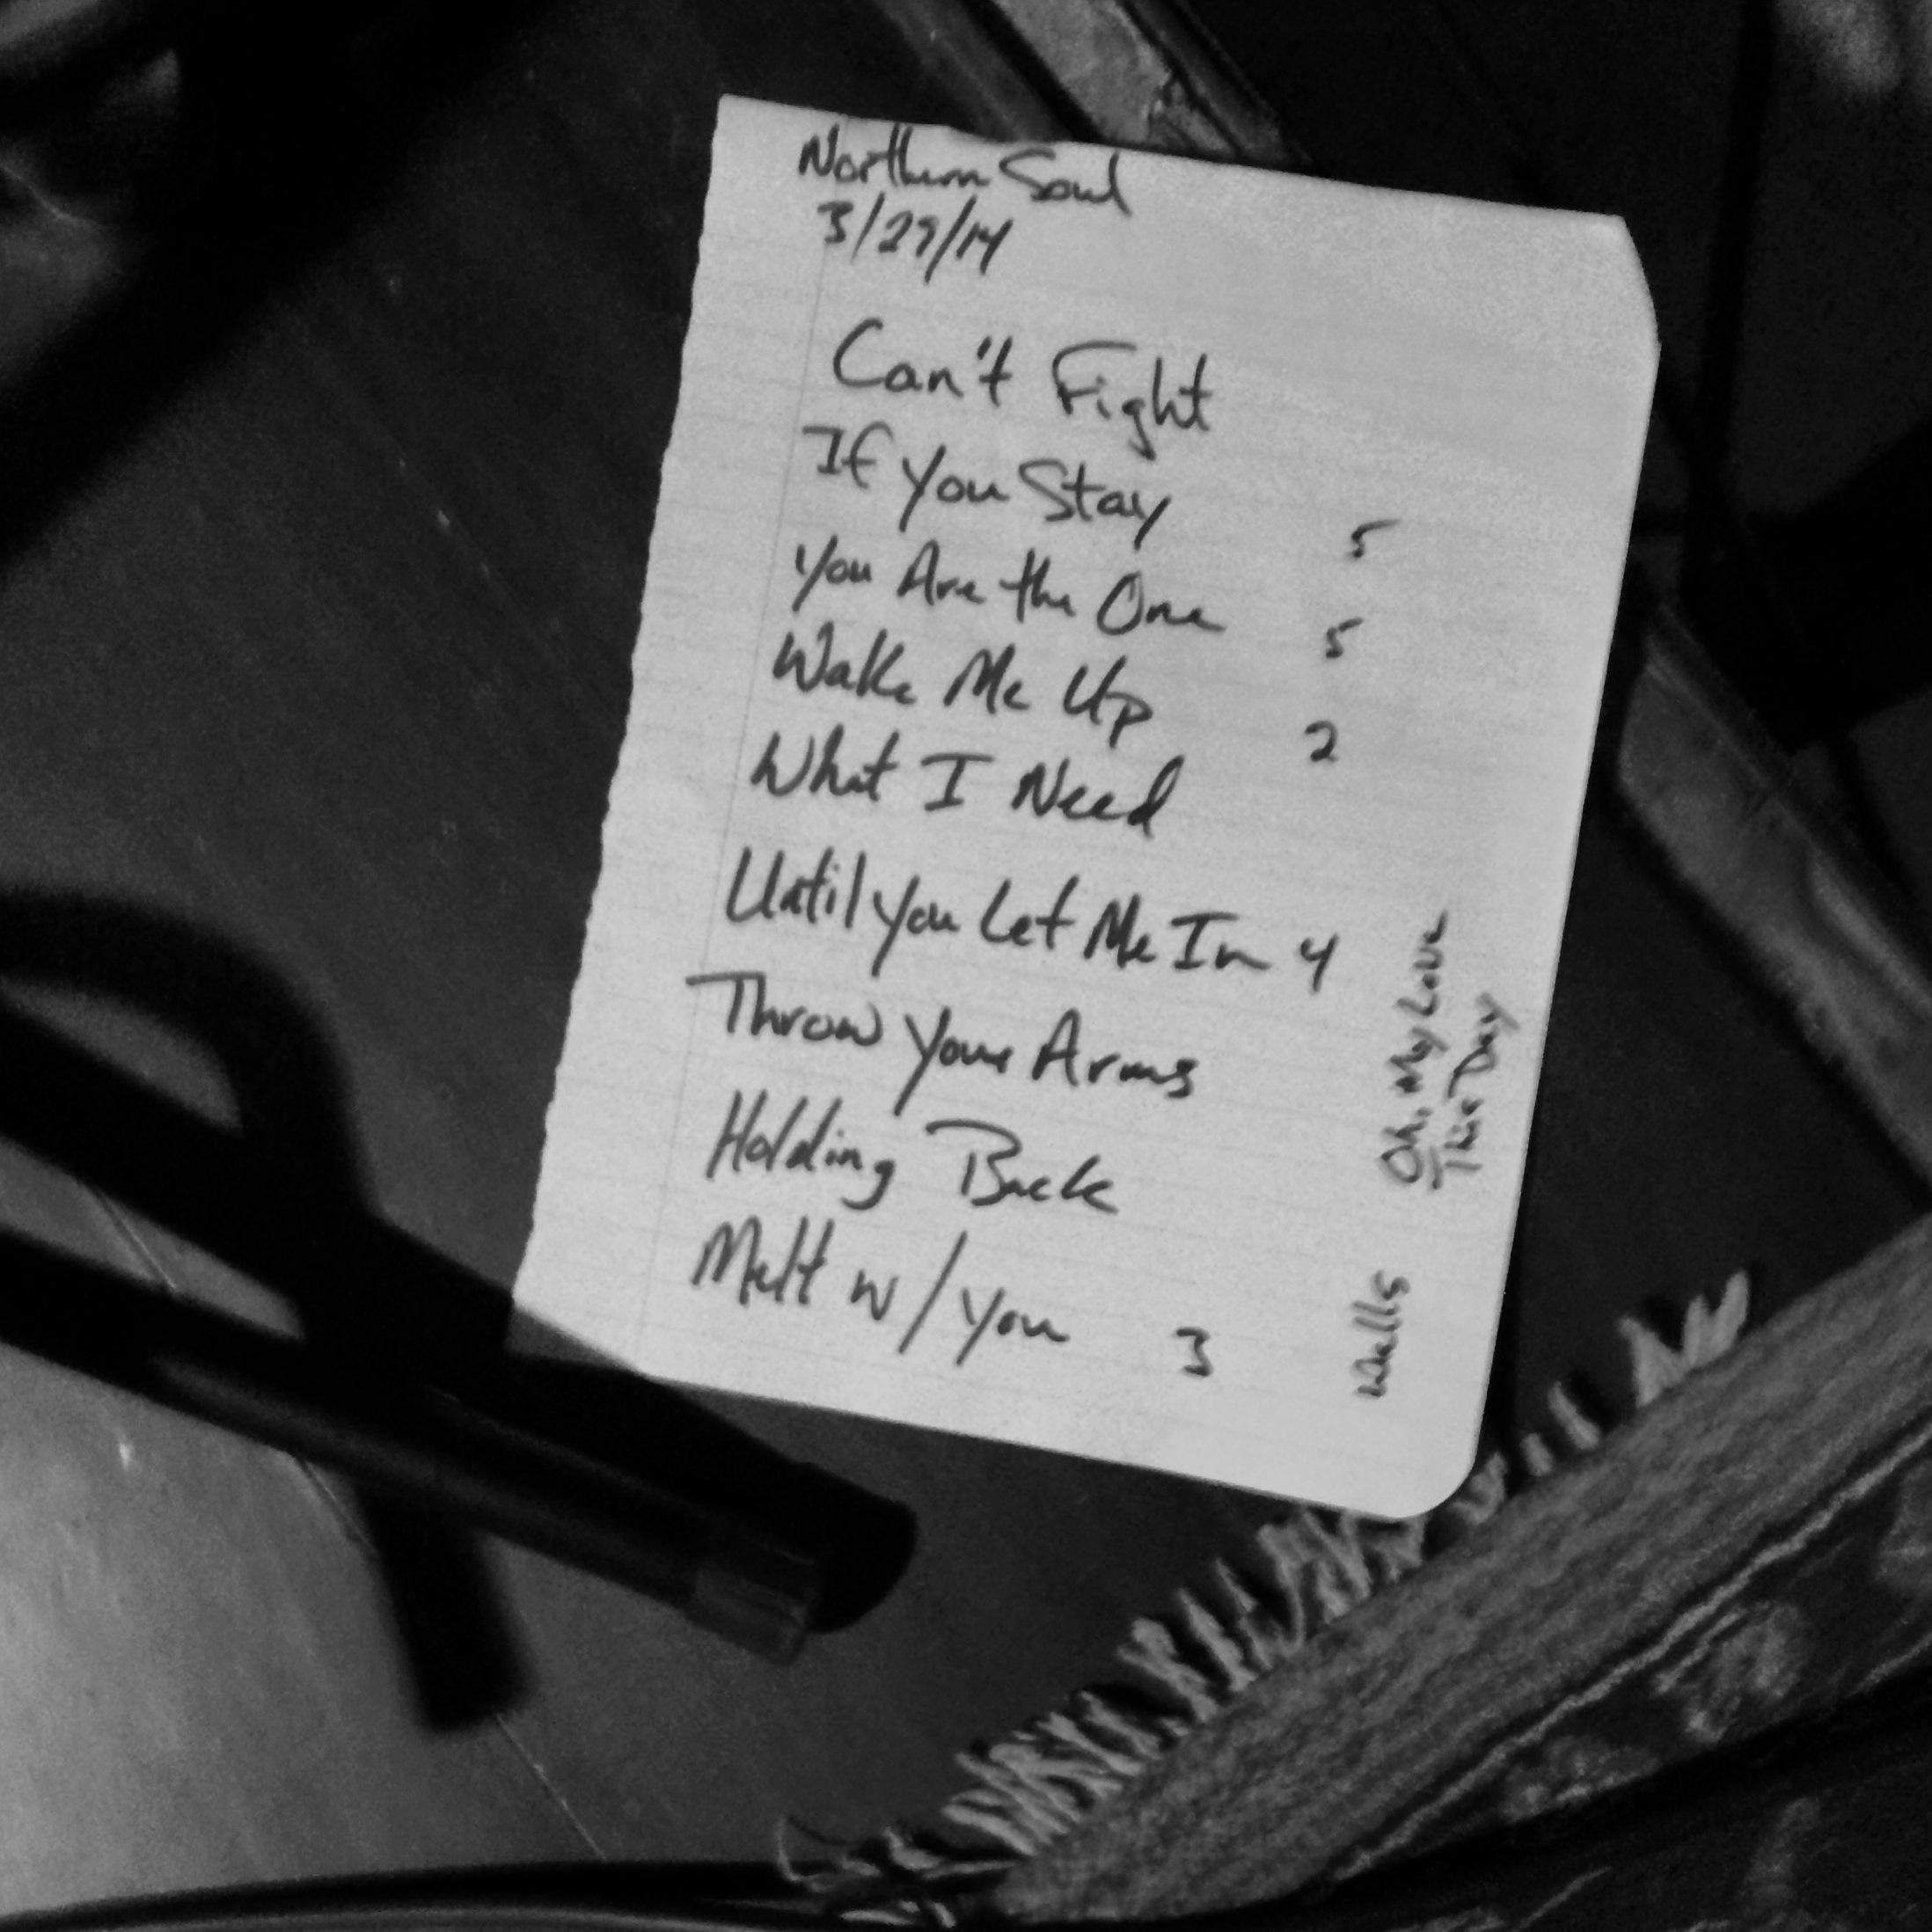 Northern Soul Setlist 032914